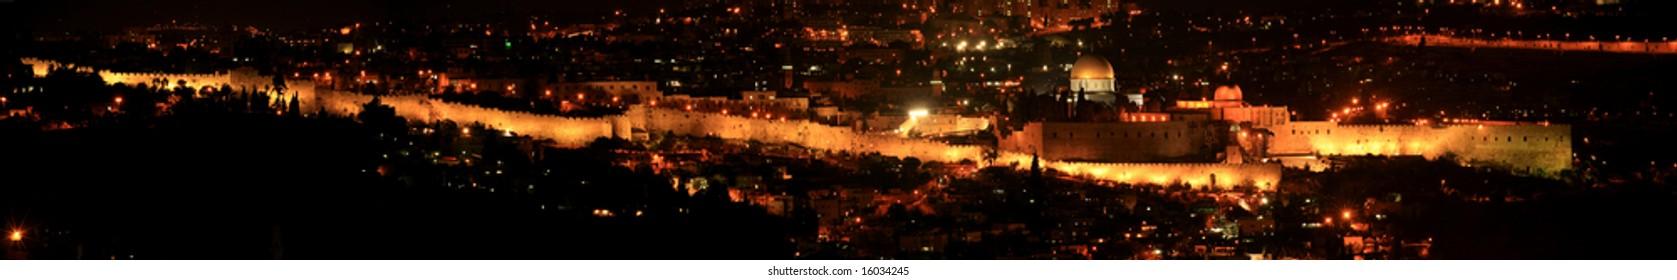 Jerusalem city walls at night